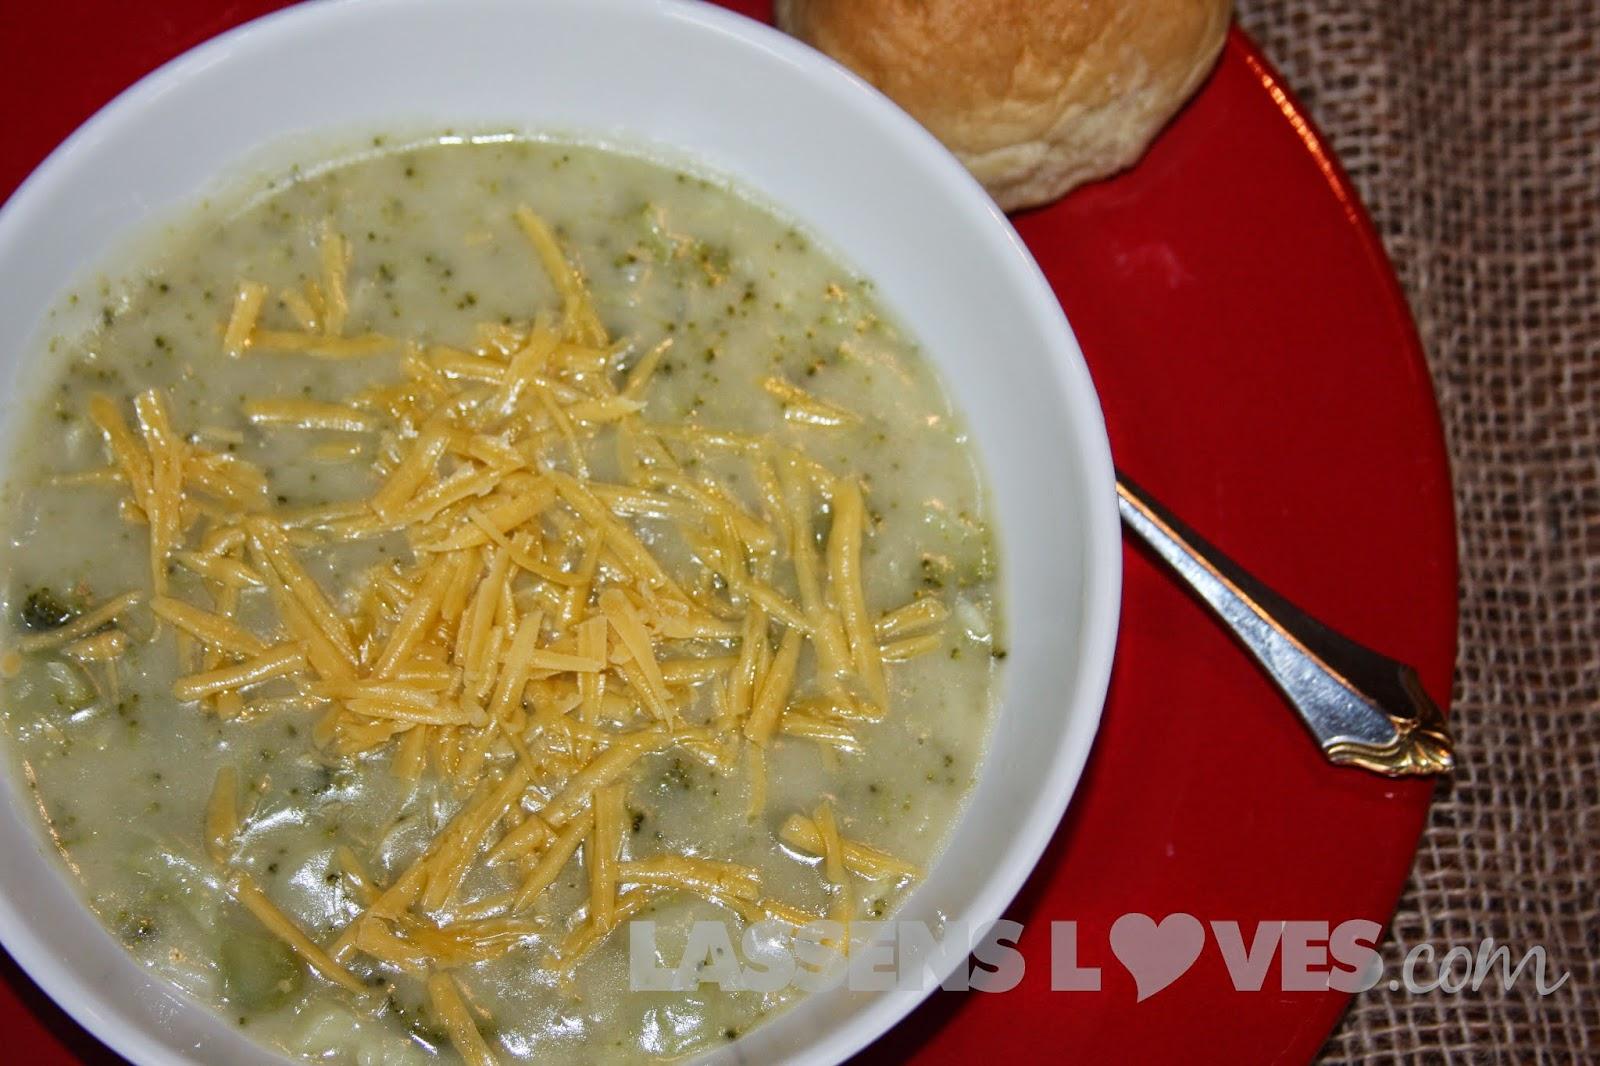 cream+of+broccoli+soup, Soup+recipes, cream+soup